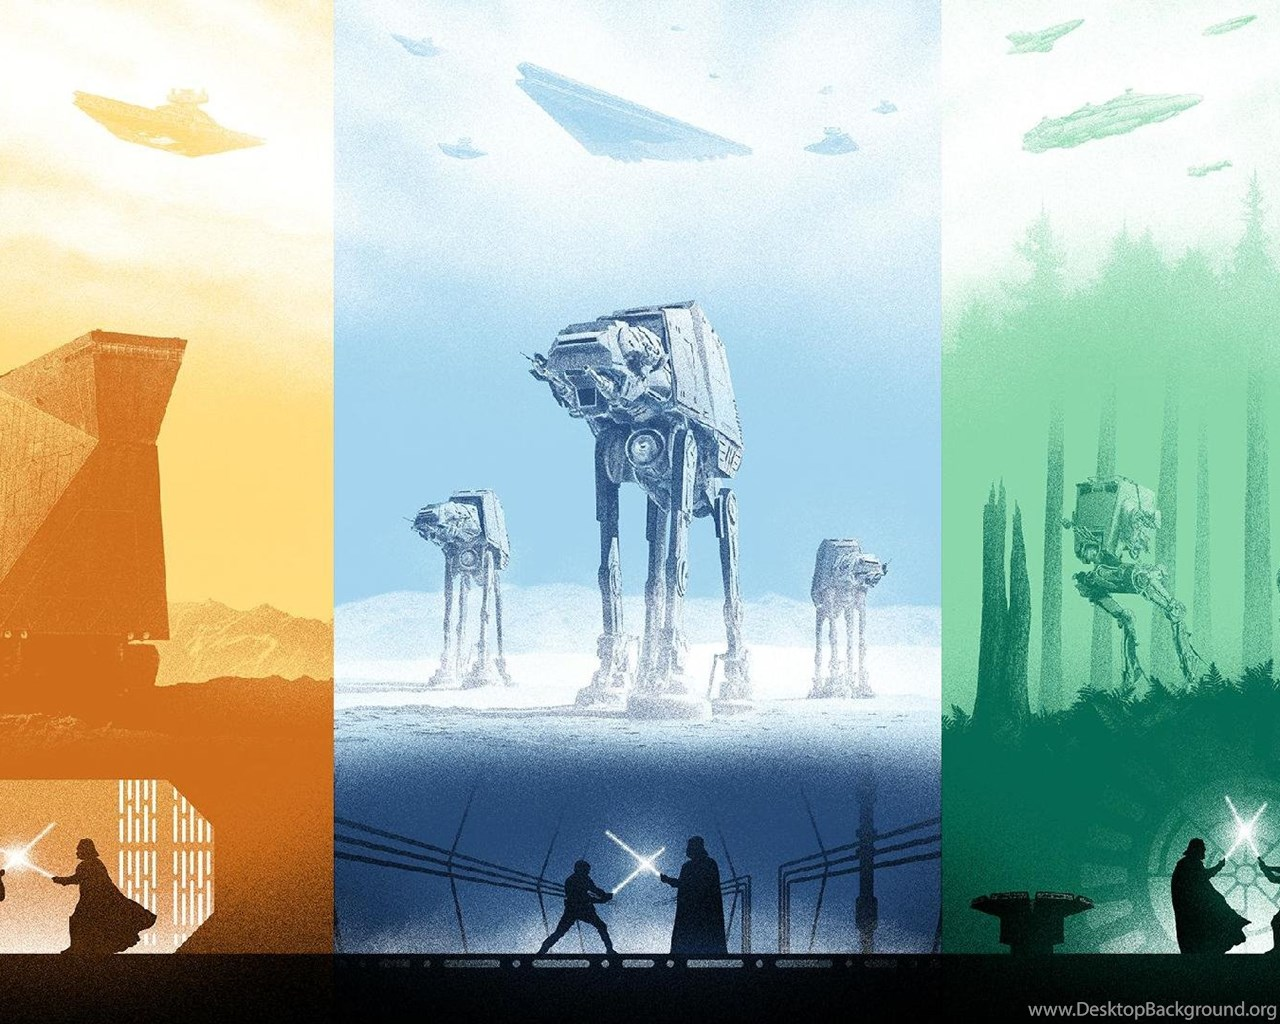 Star Wars Wallpaper_hd Wallpaper_download Free Wallpapers